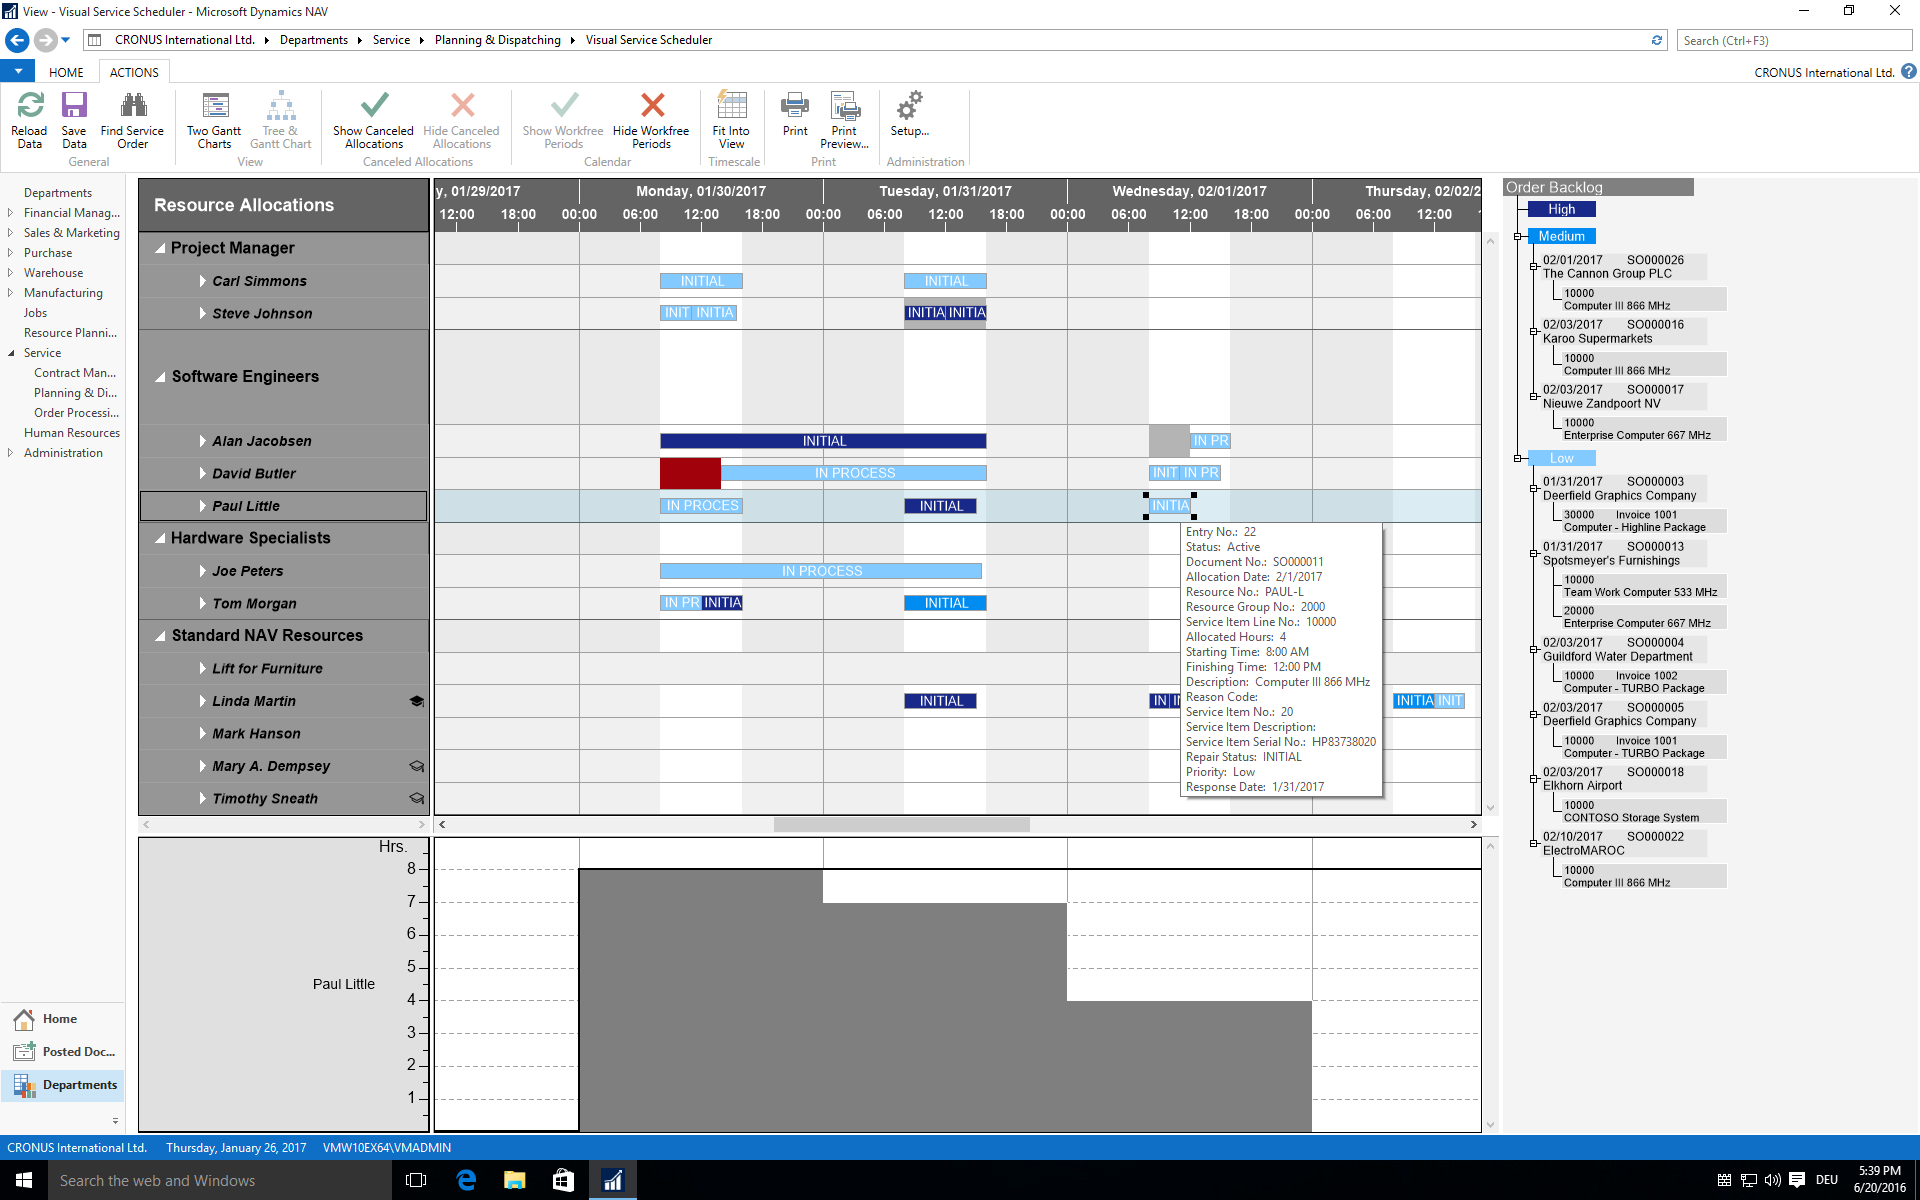 2016-06-20_Screenshot_Visual_Service_Scheduler_for_Dynamics_NAV.png